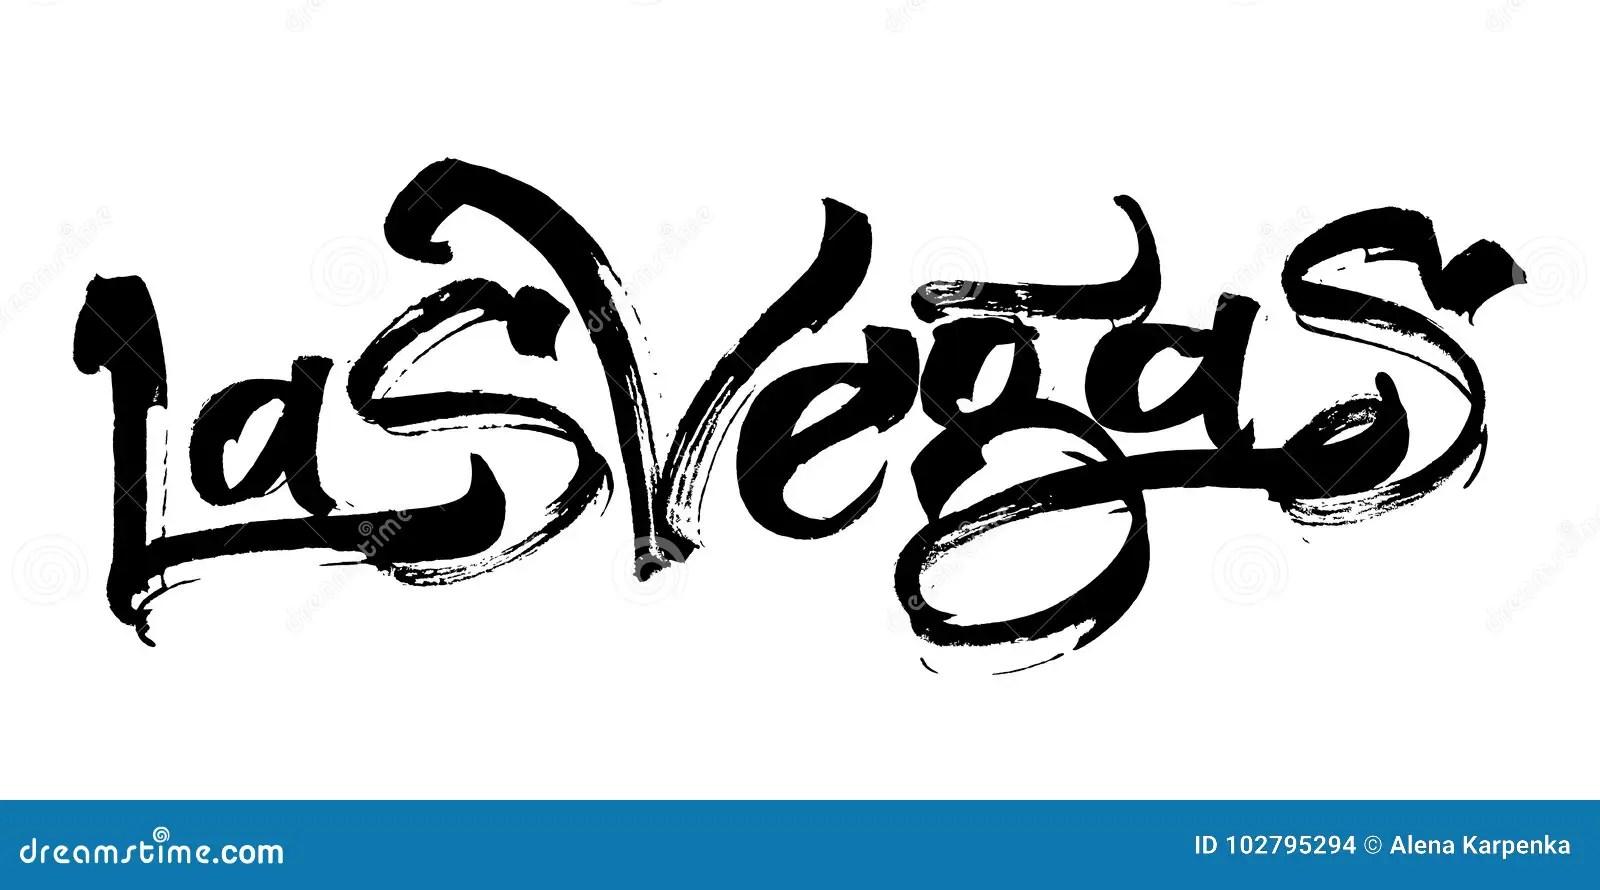 Las Vegas. Modern Calligraphy Hand Lettering For